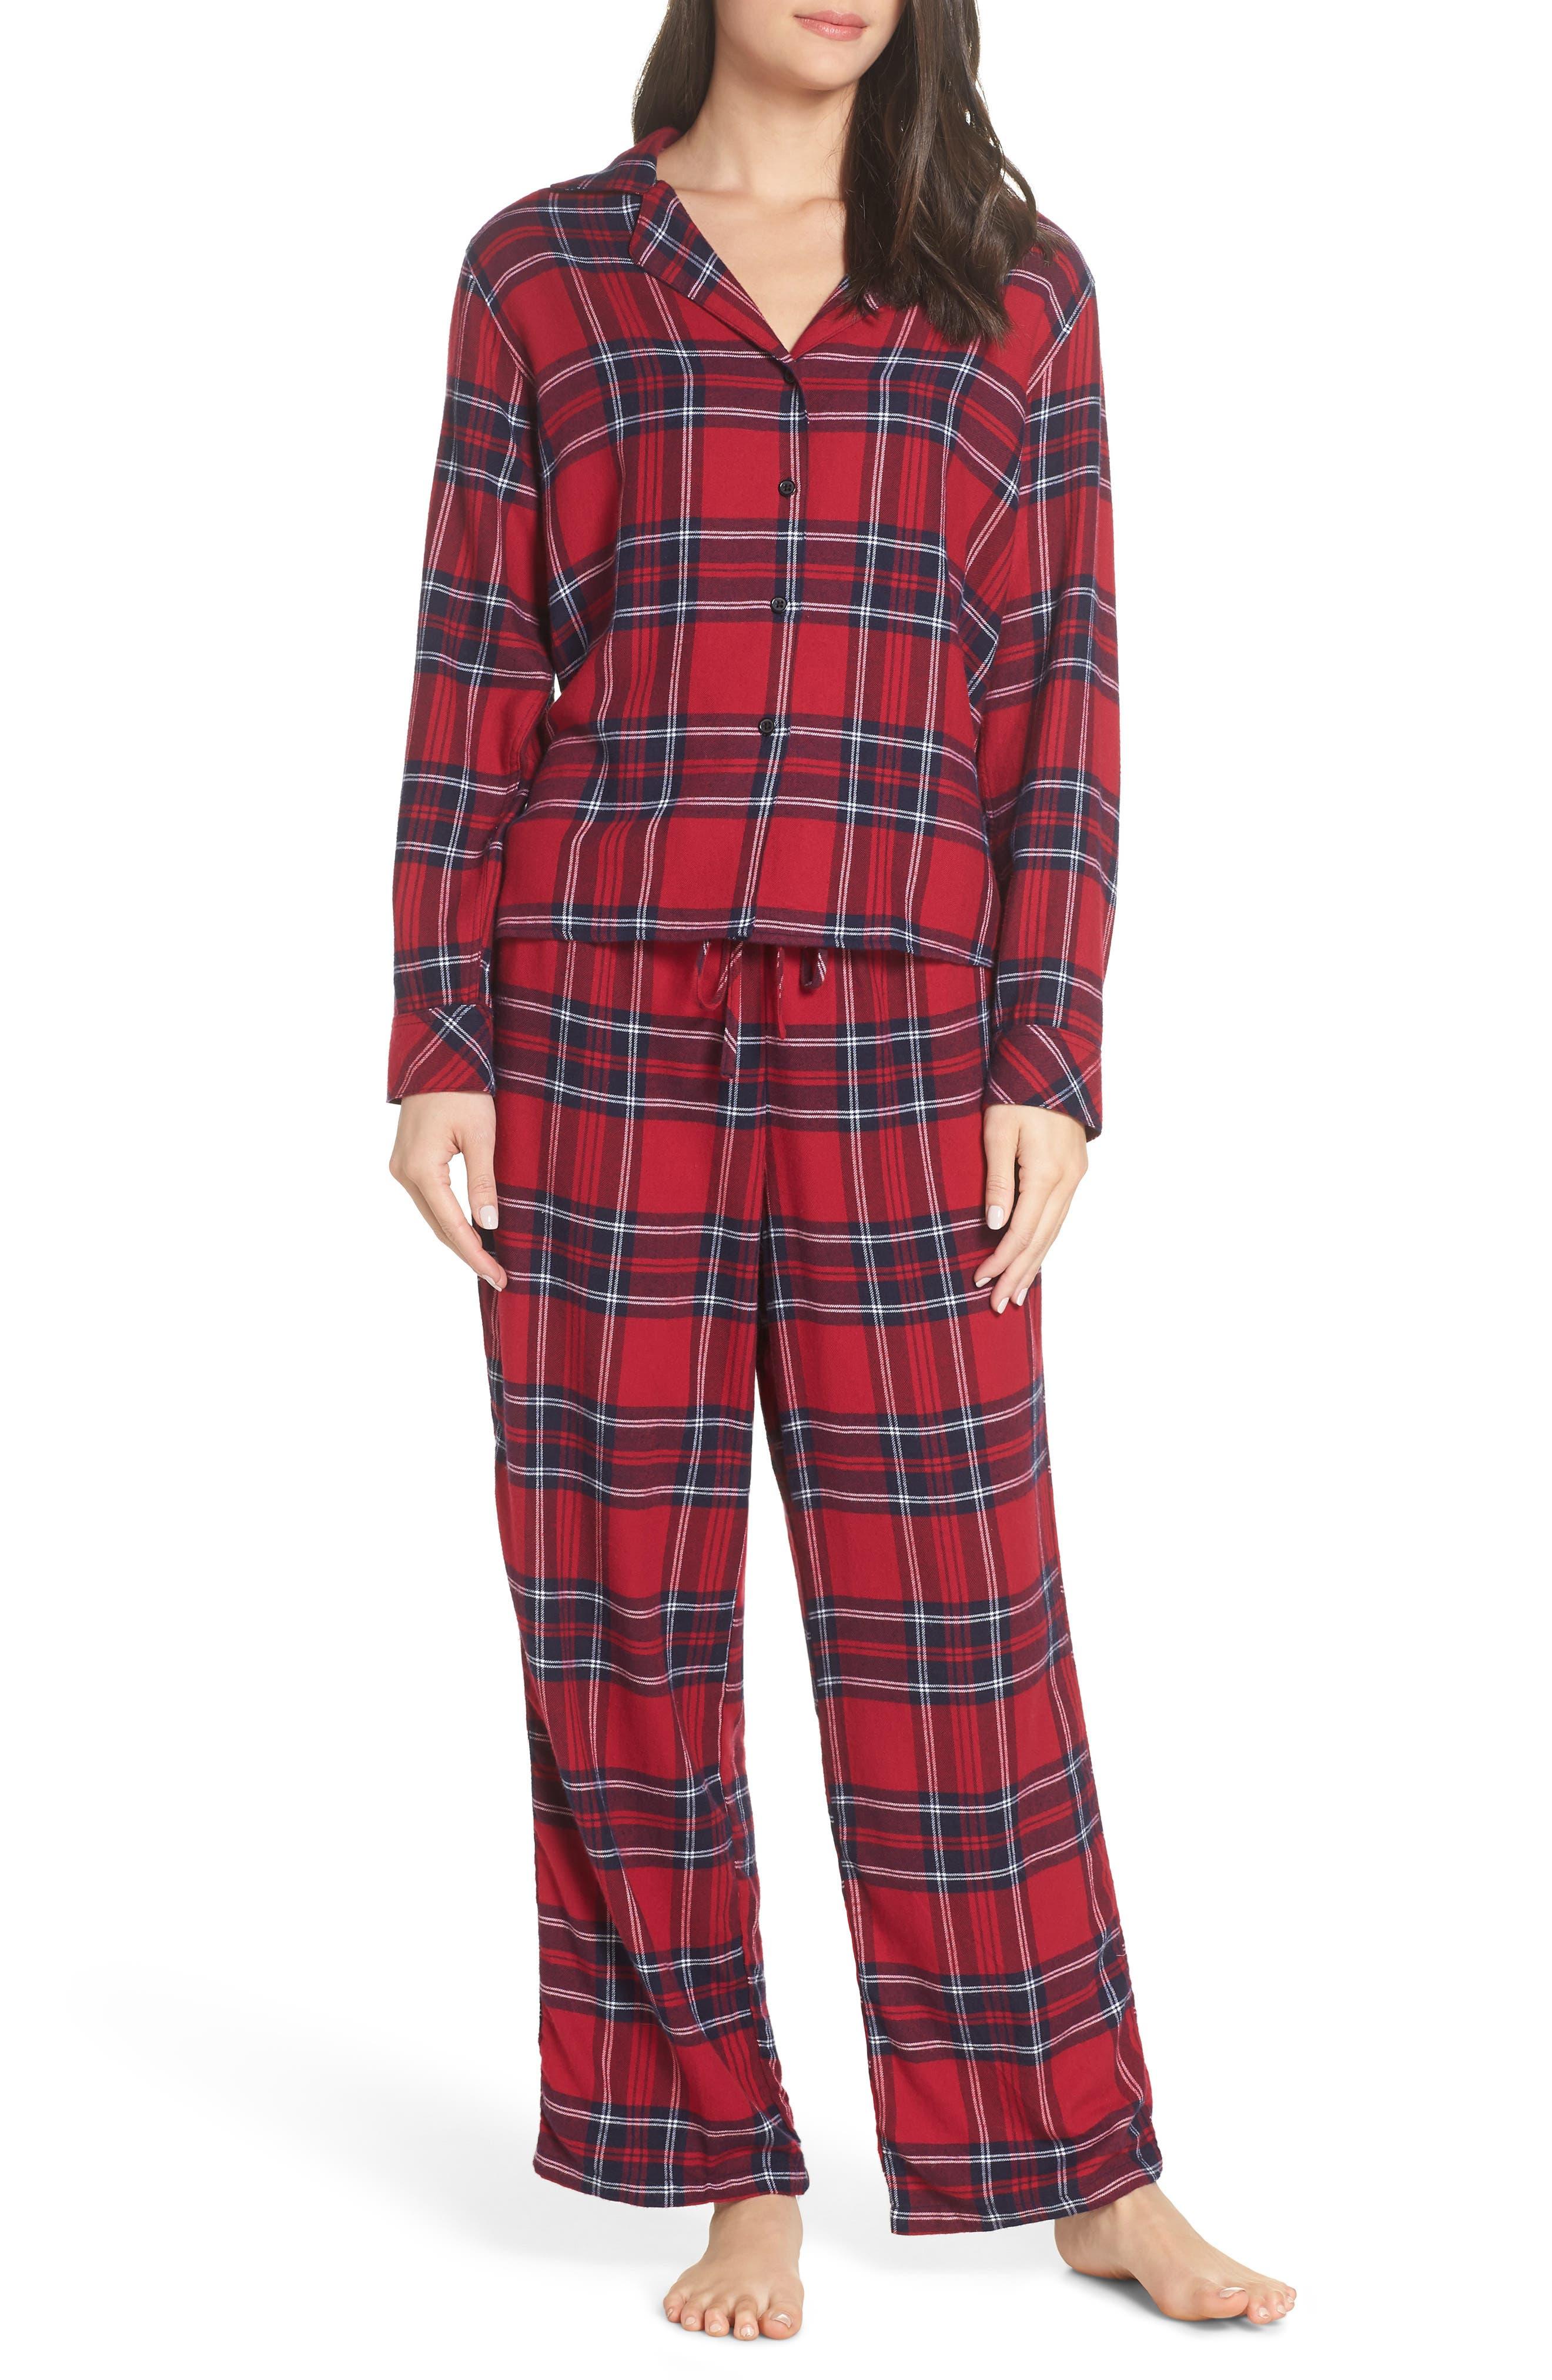 Plaid Pajamas,                             Main thumbnail 1, color,                             SCARLET NAVY WHITE